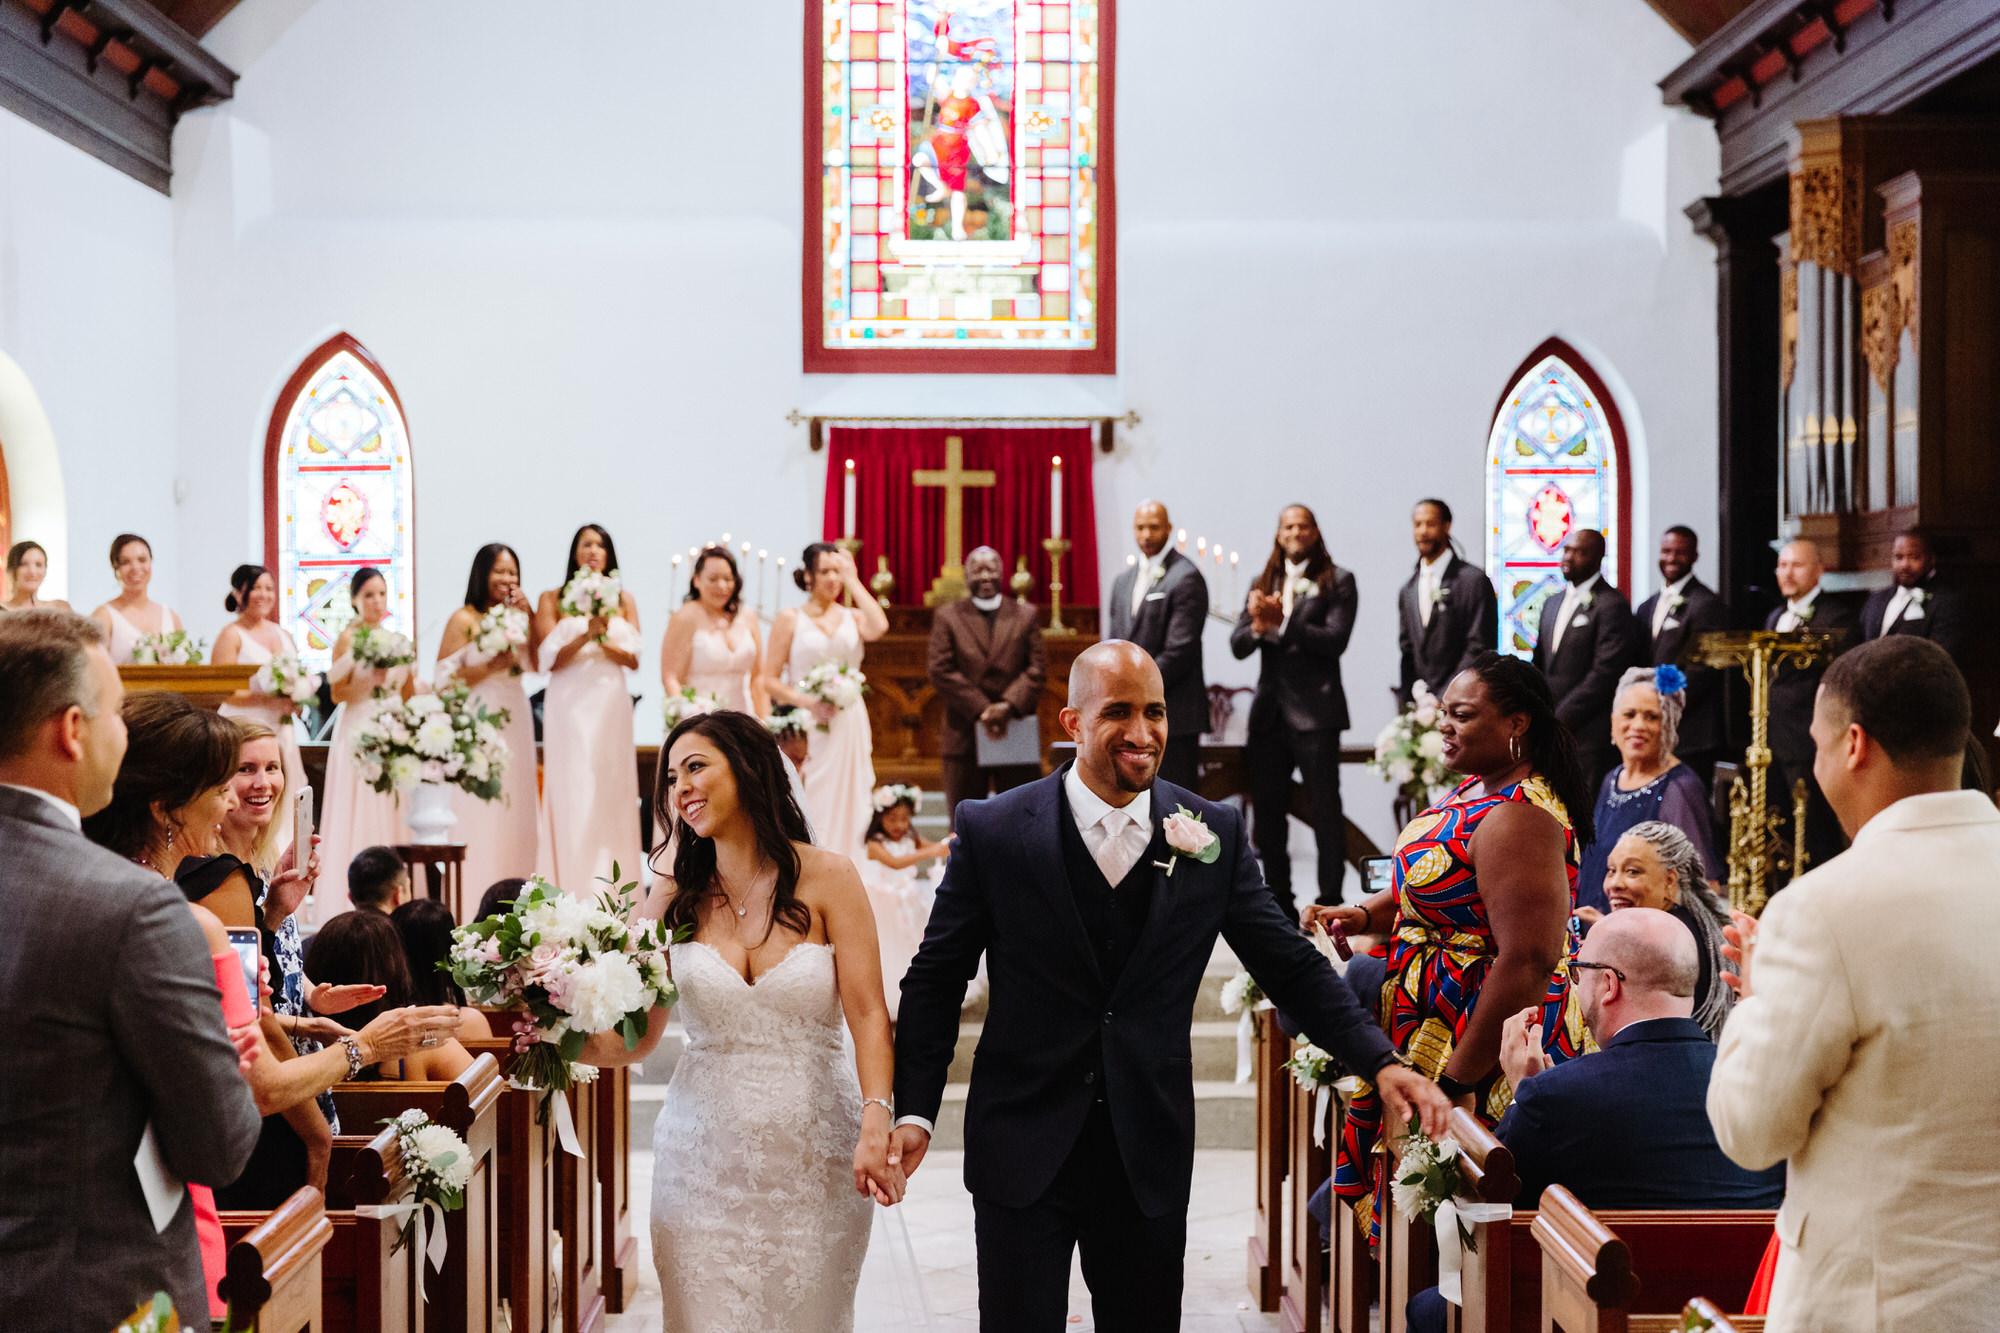 st-lukes-chapel-cannon-green-charleston-wedding-936.JPG